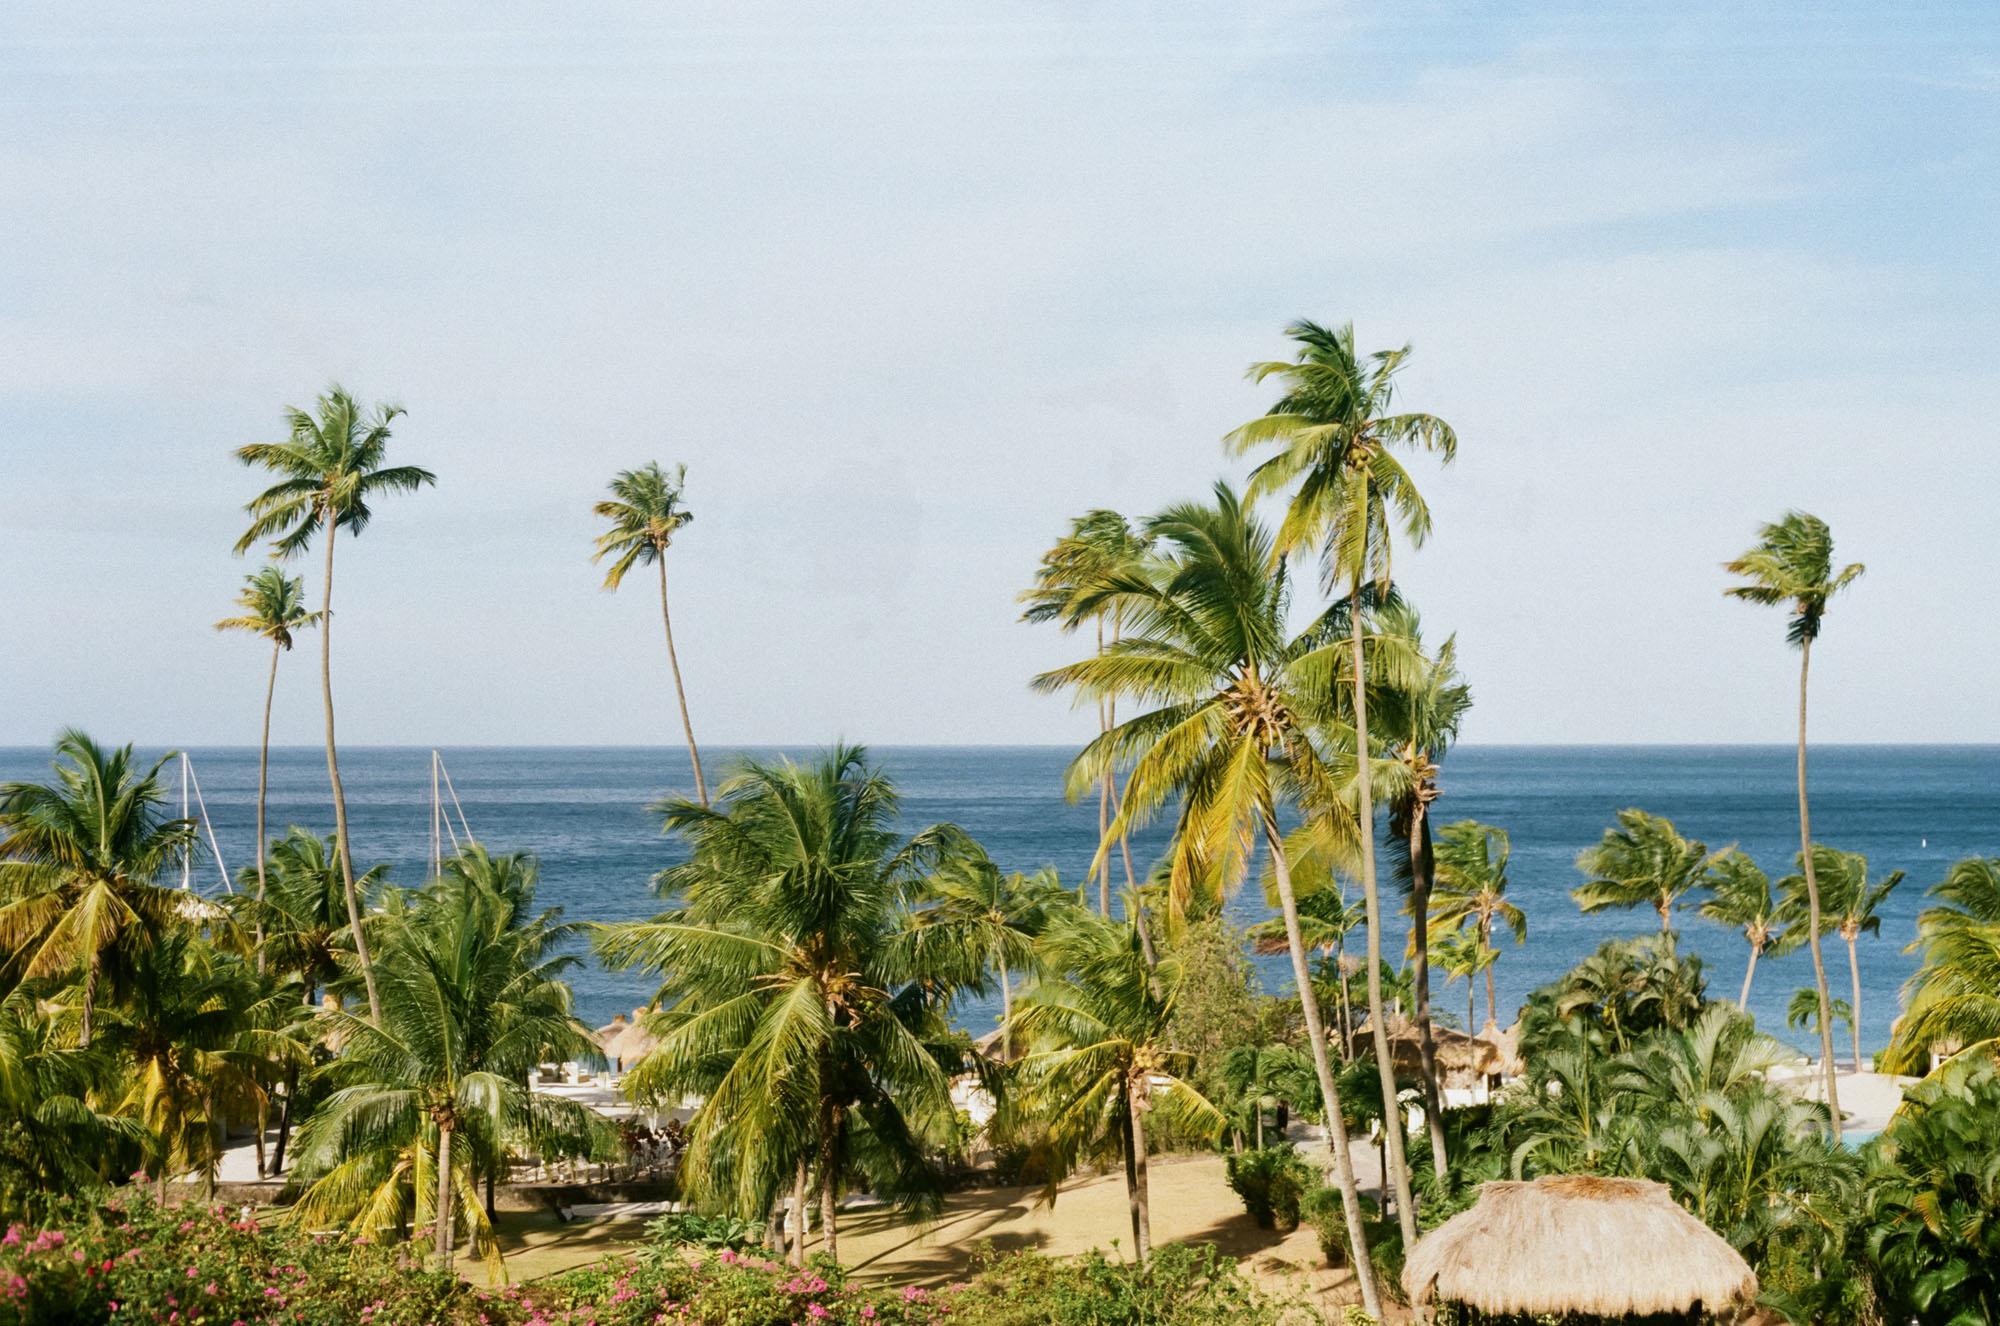 travel-photography-film-st-lucia-sugar-beach-resort